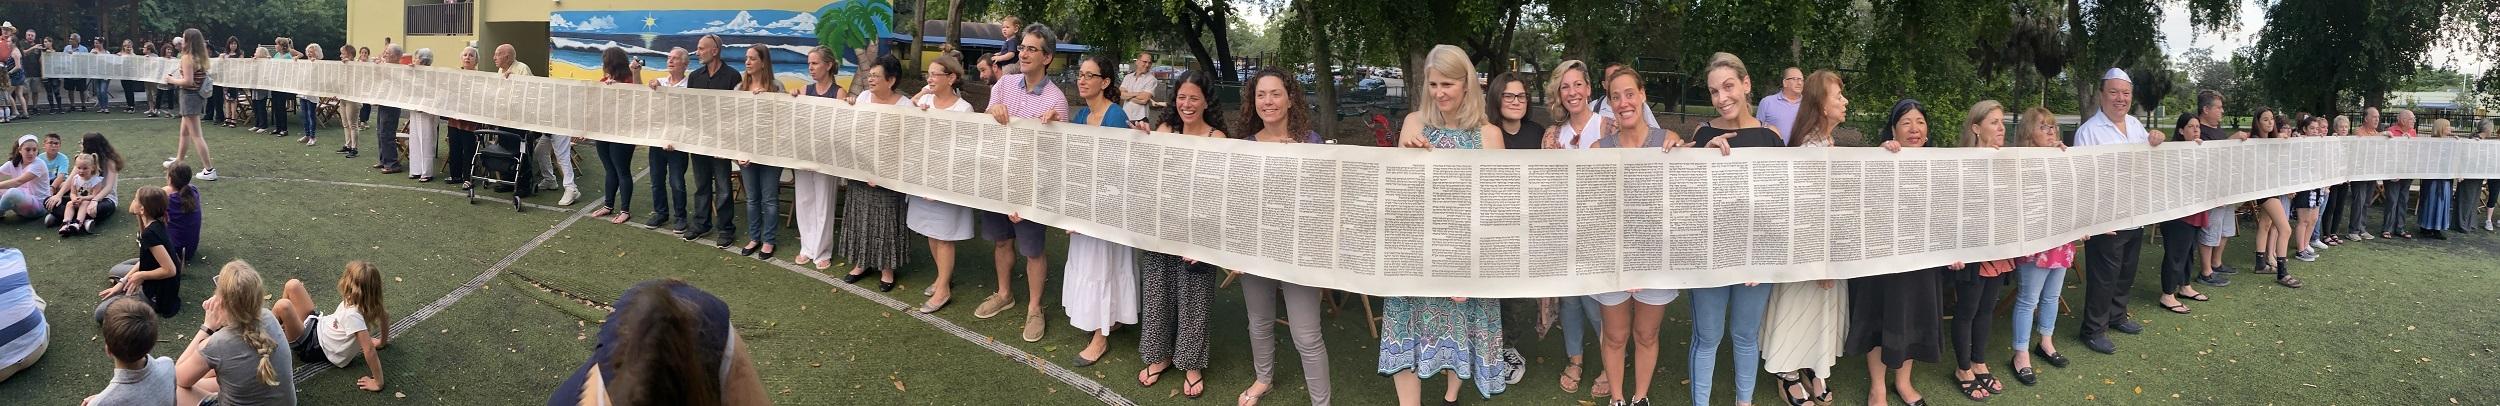 "<span class=""slider_title"">                                     Simchat Torah                                </span>"